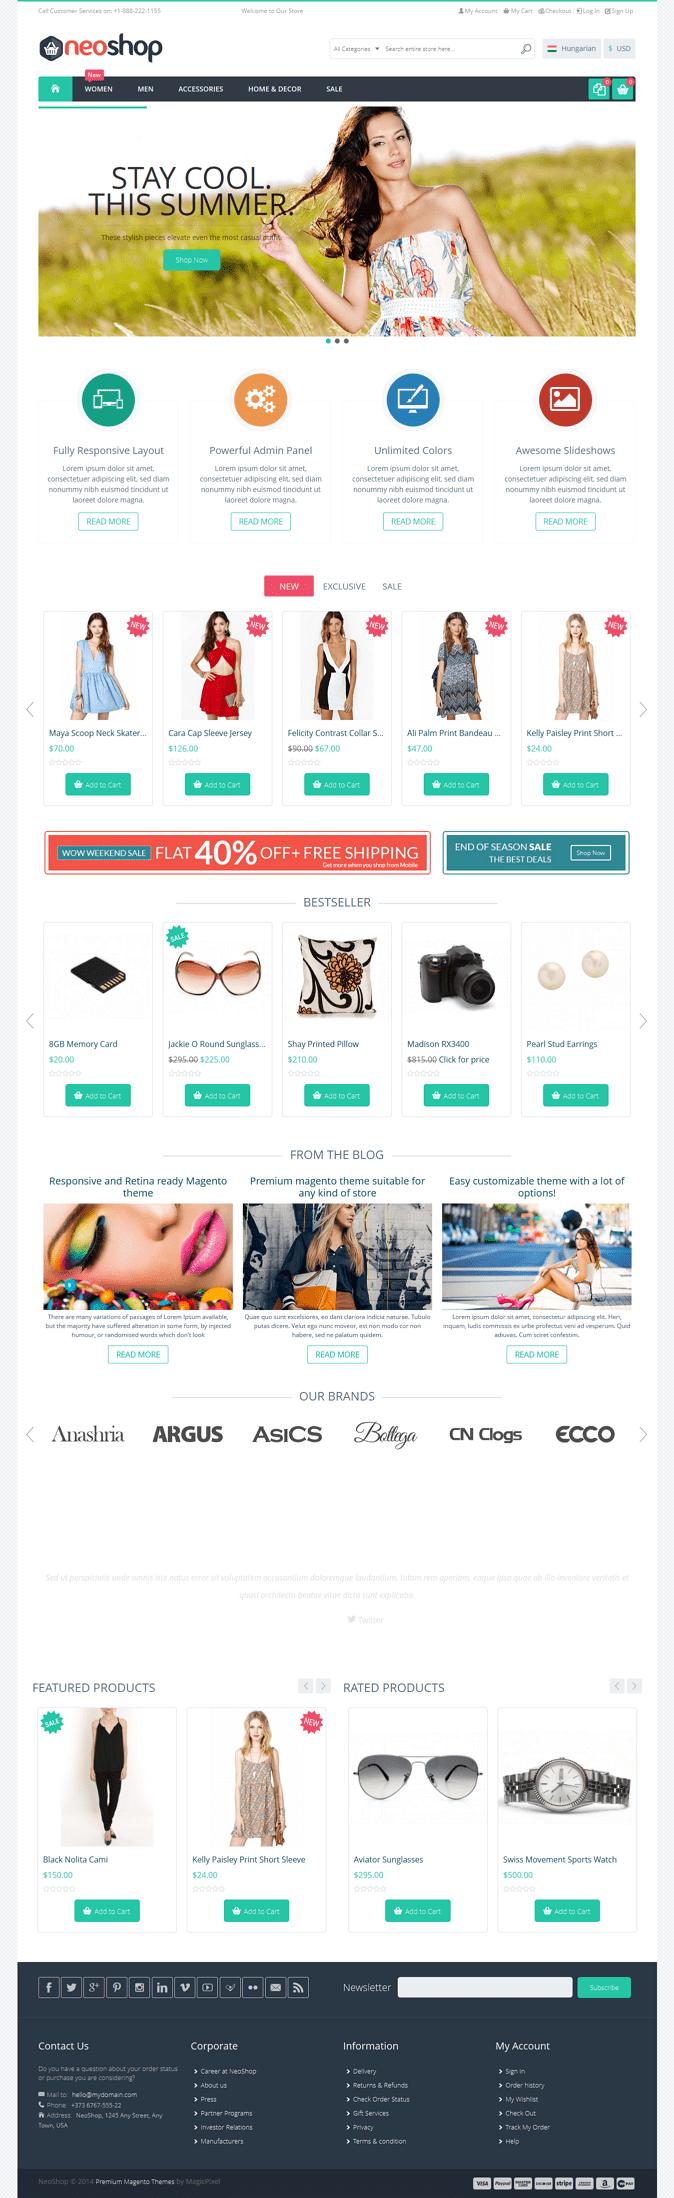 #website #design #eCommerce #Neoshop Responsive & Retina Ready #Magento Theme ->>